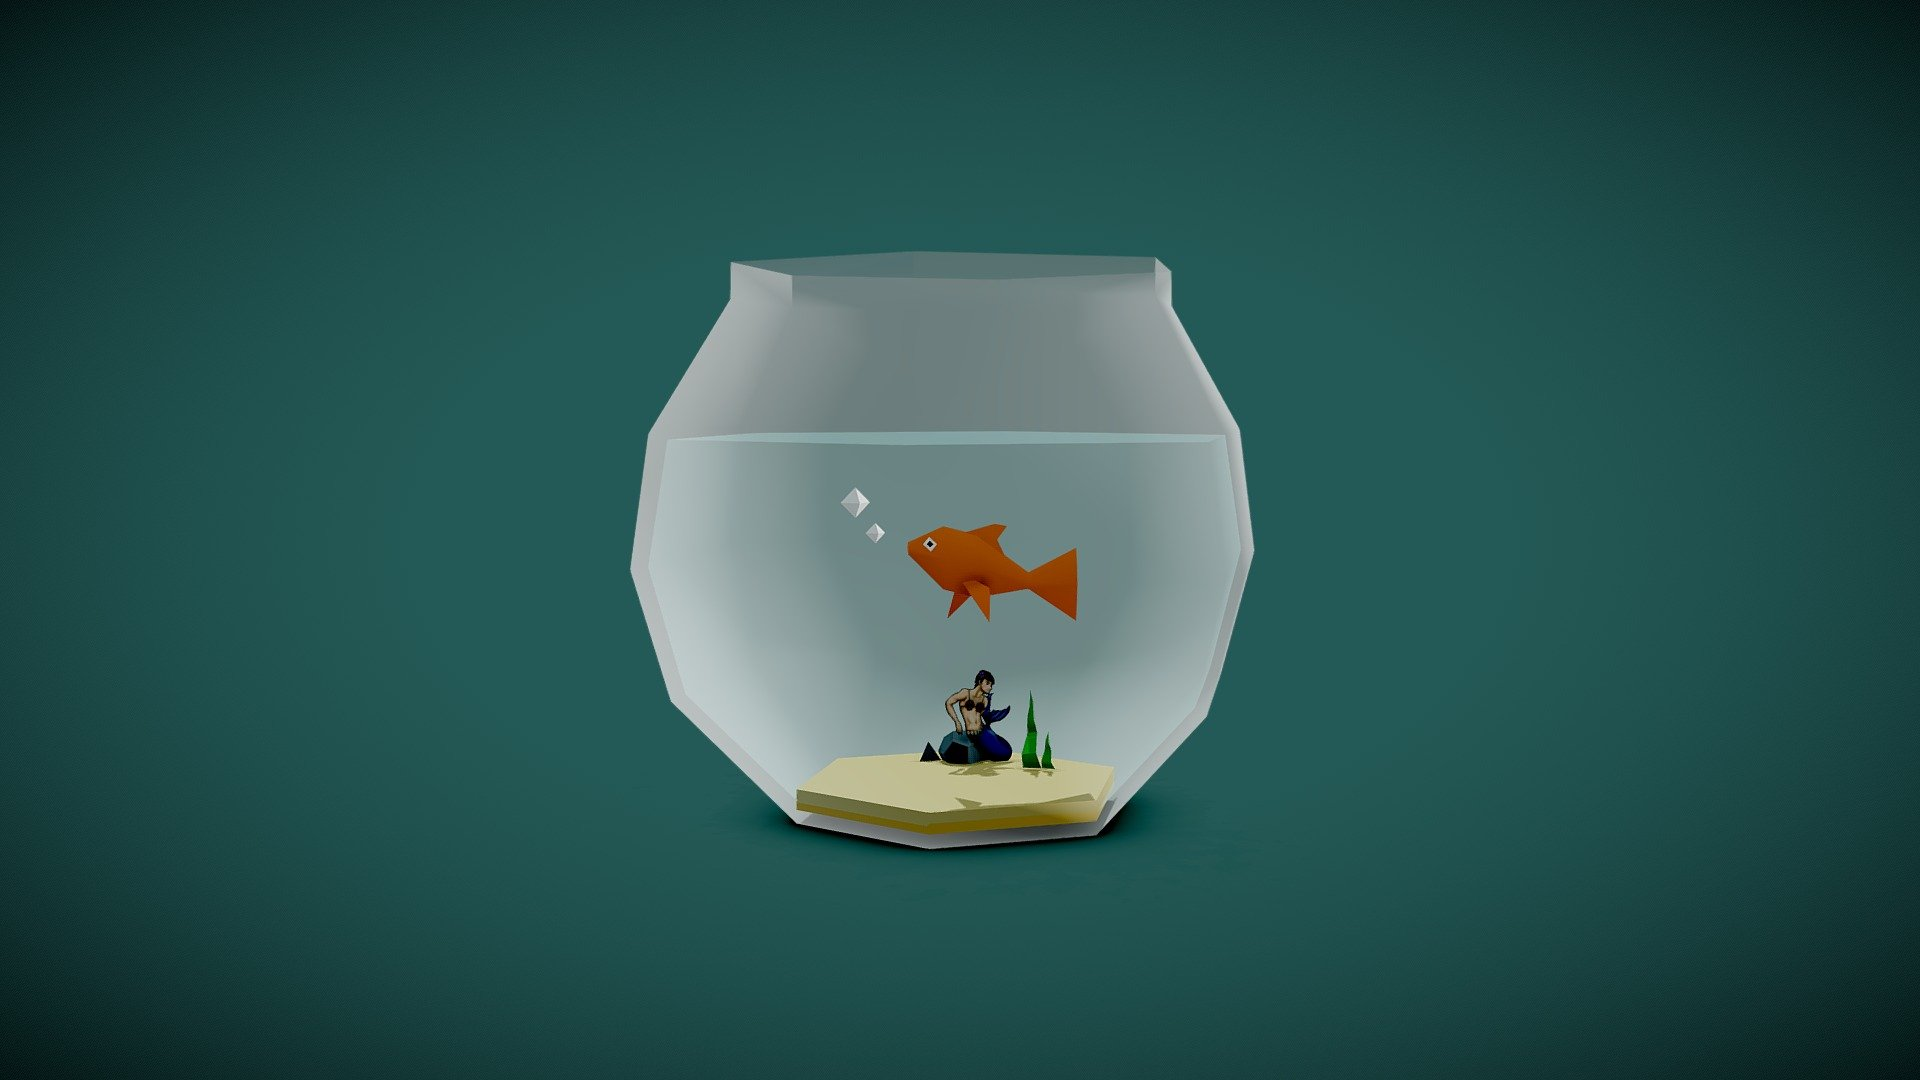 Goldfish 3D Models for Download | TurboSquid